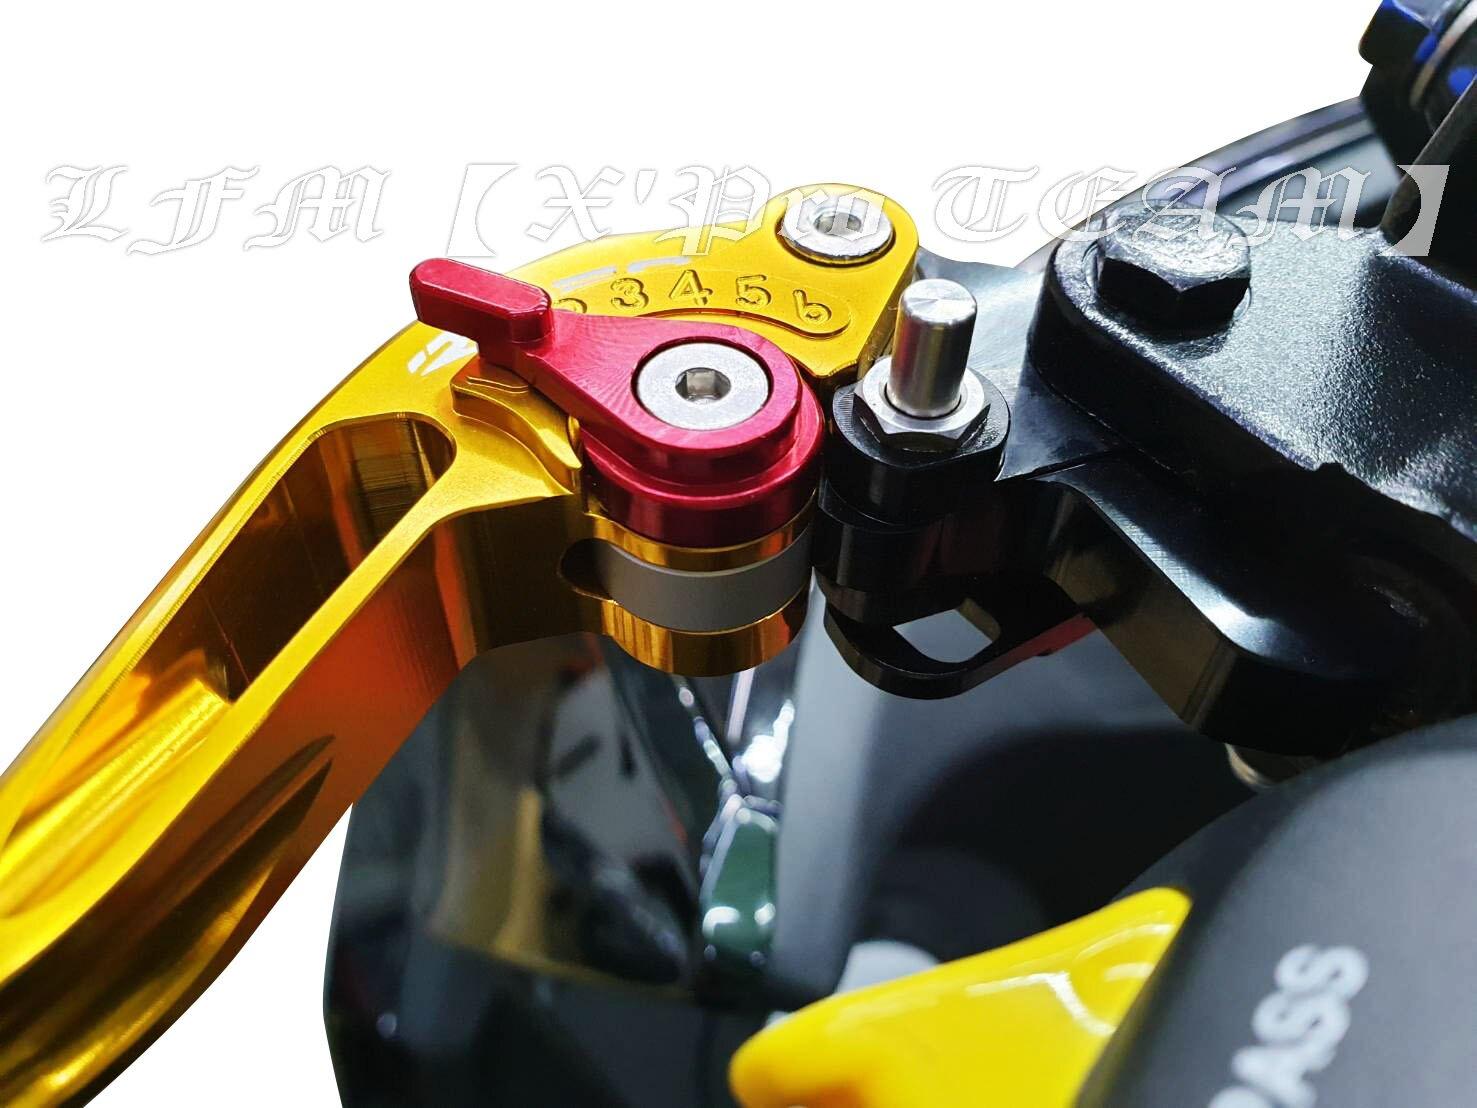 【LFM】RIDEA DRG158 DRG 可調式煞車拉桿 附手剎車 可折式 可延長 競速版 短拉桿 勁速 送鍍鈦拉桿螺絲